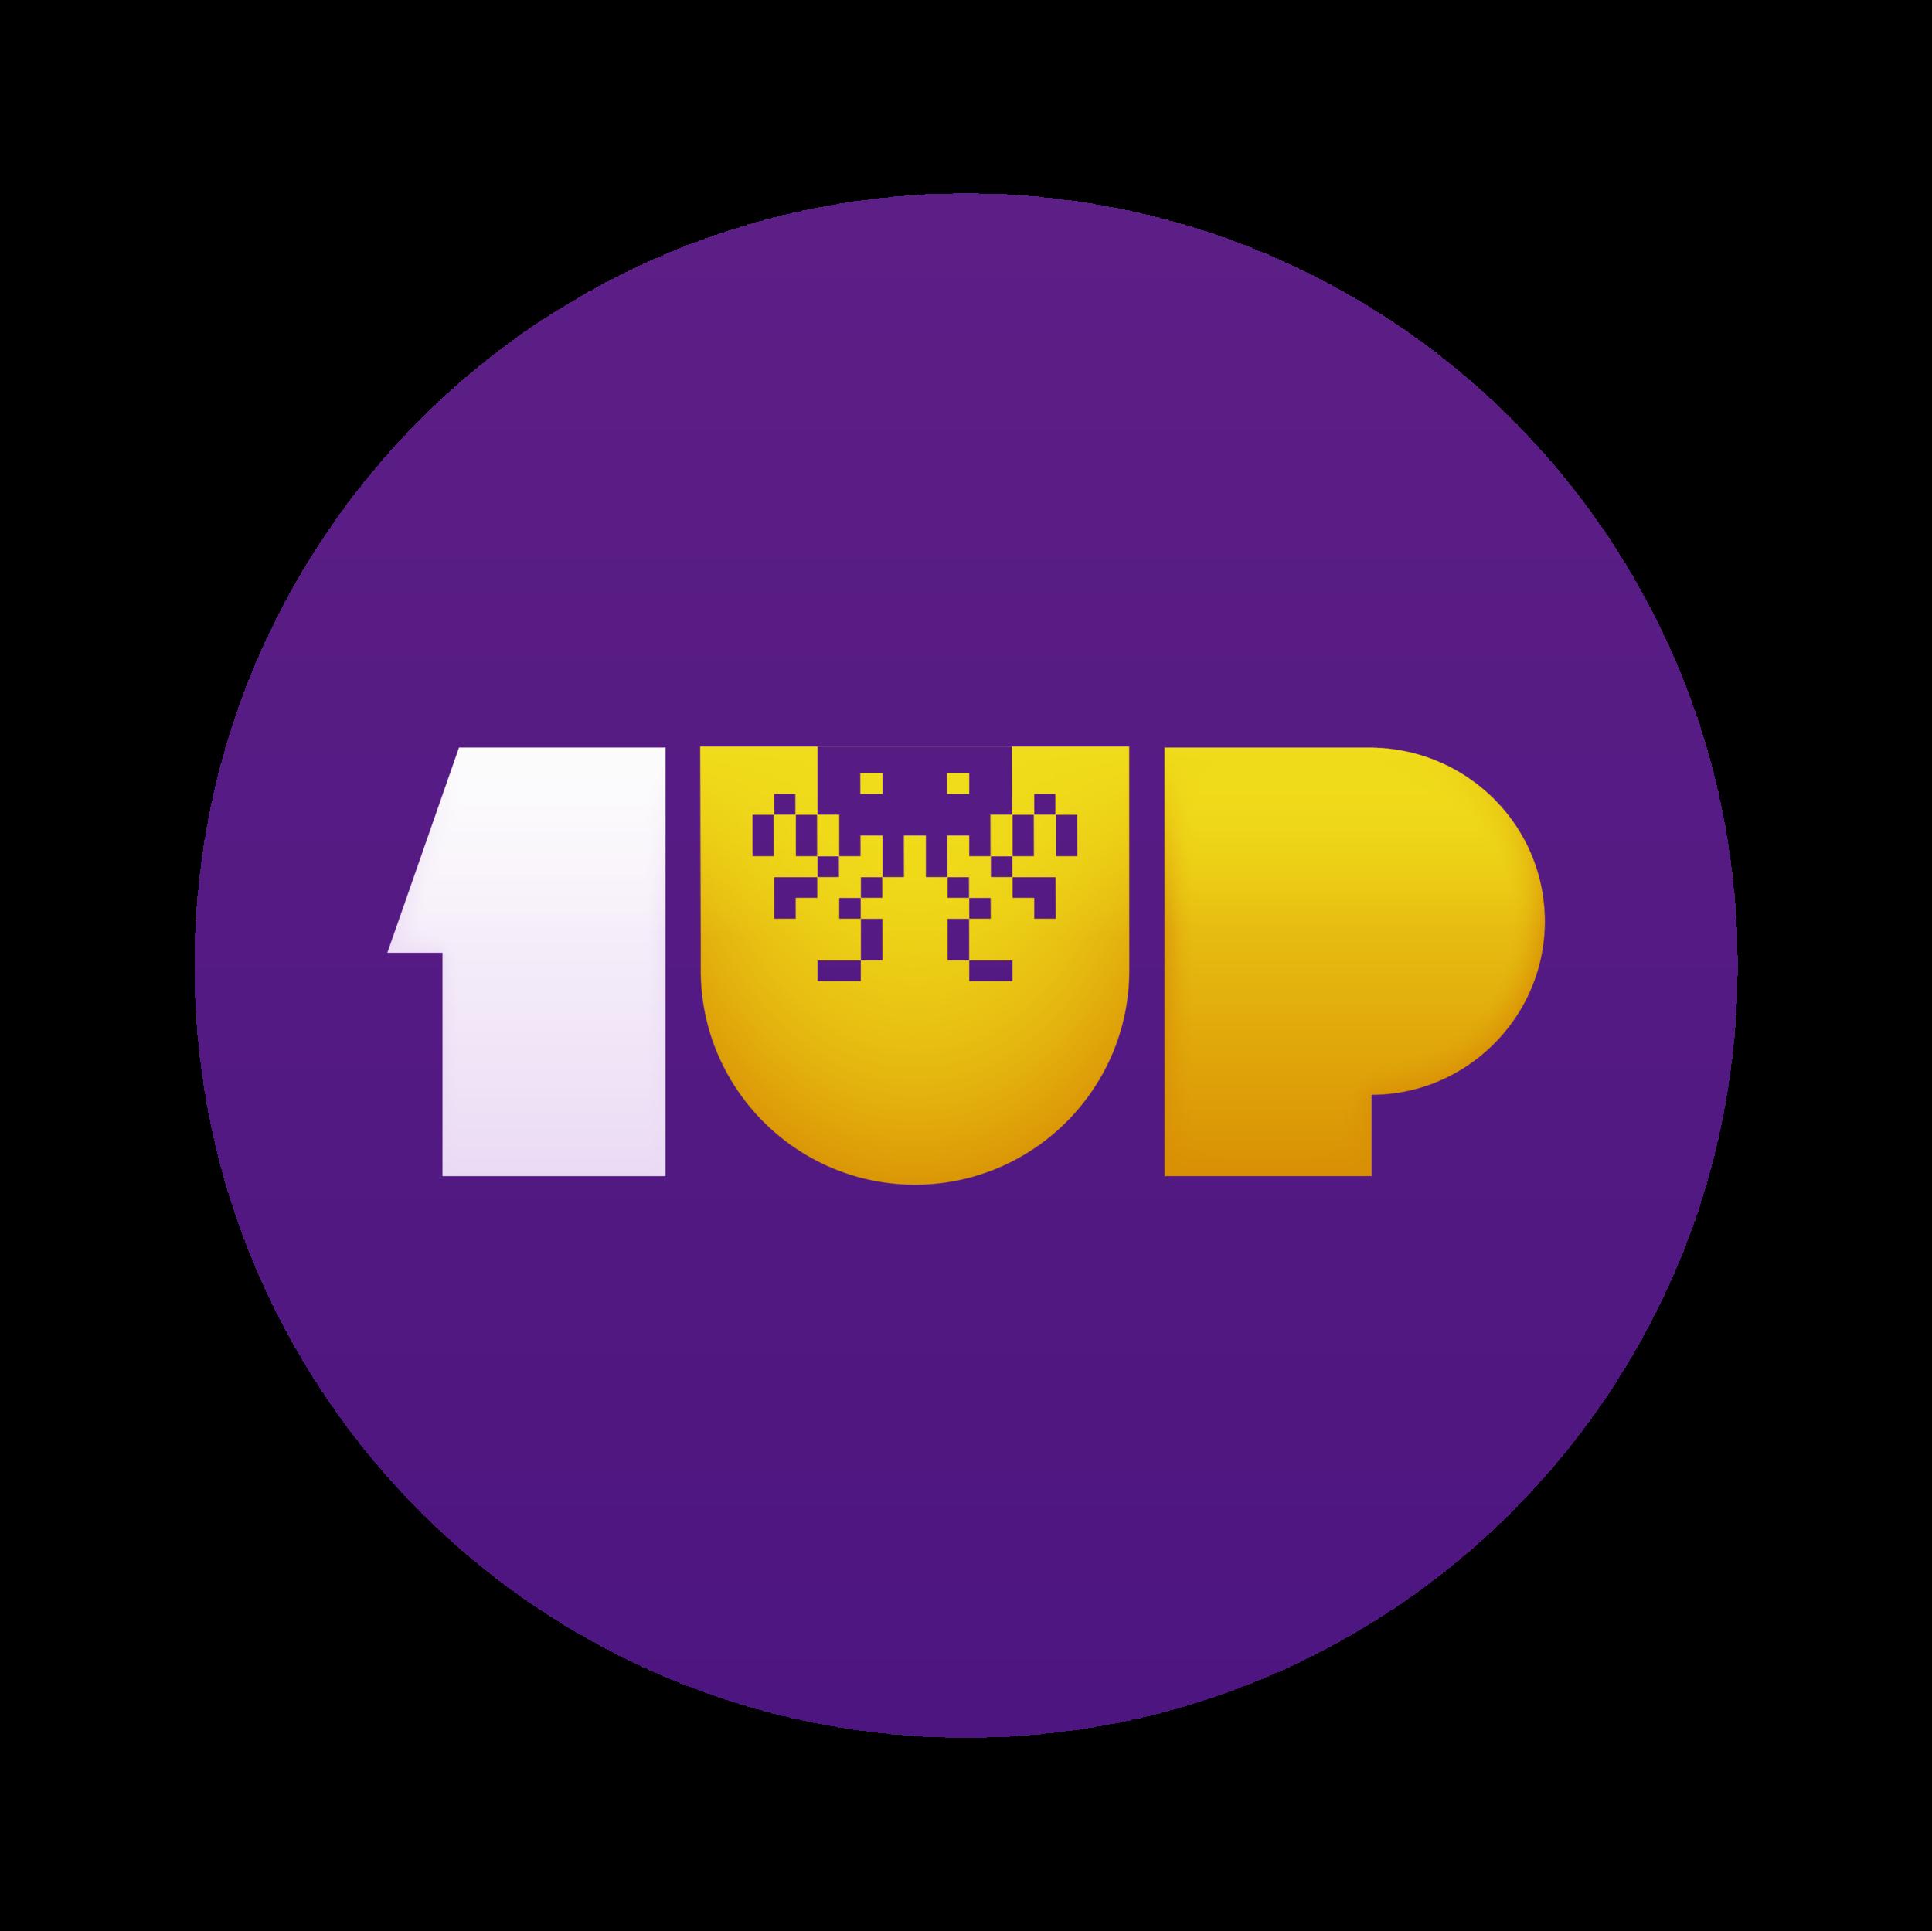 1UP logo-06.png